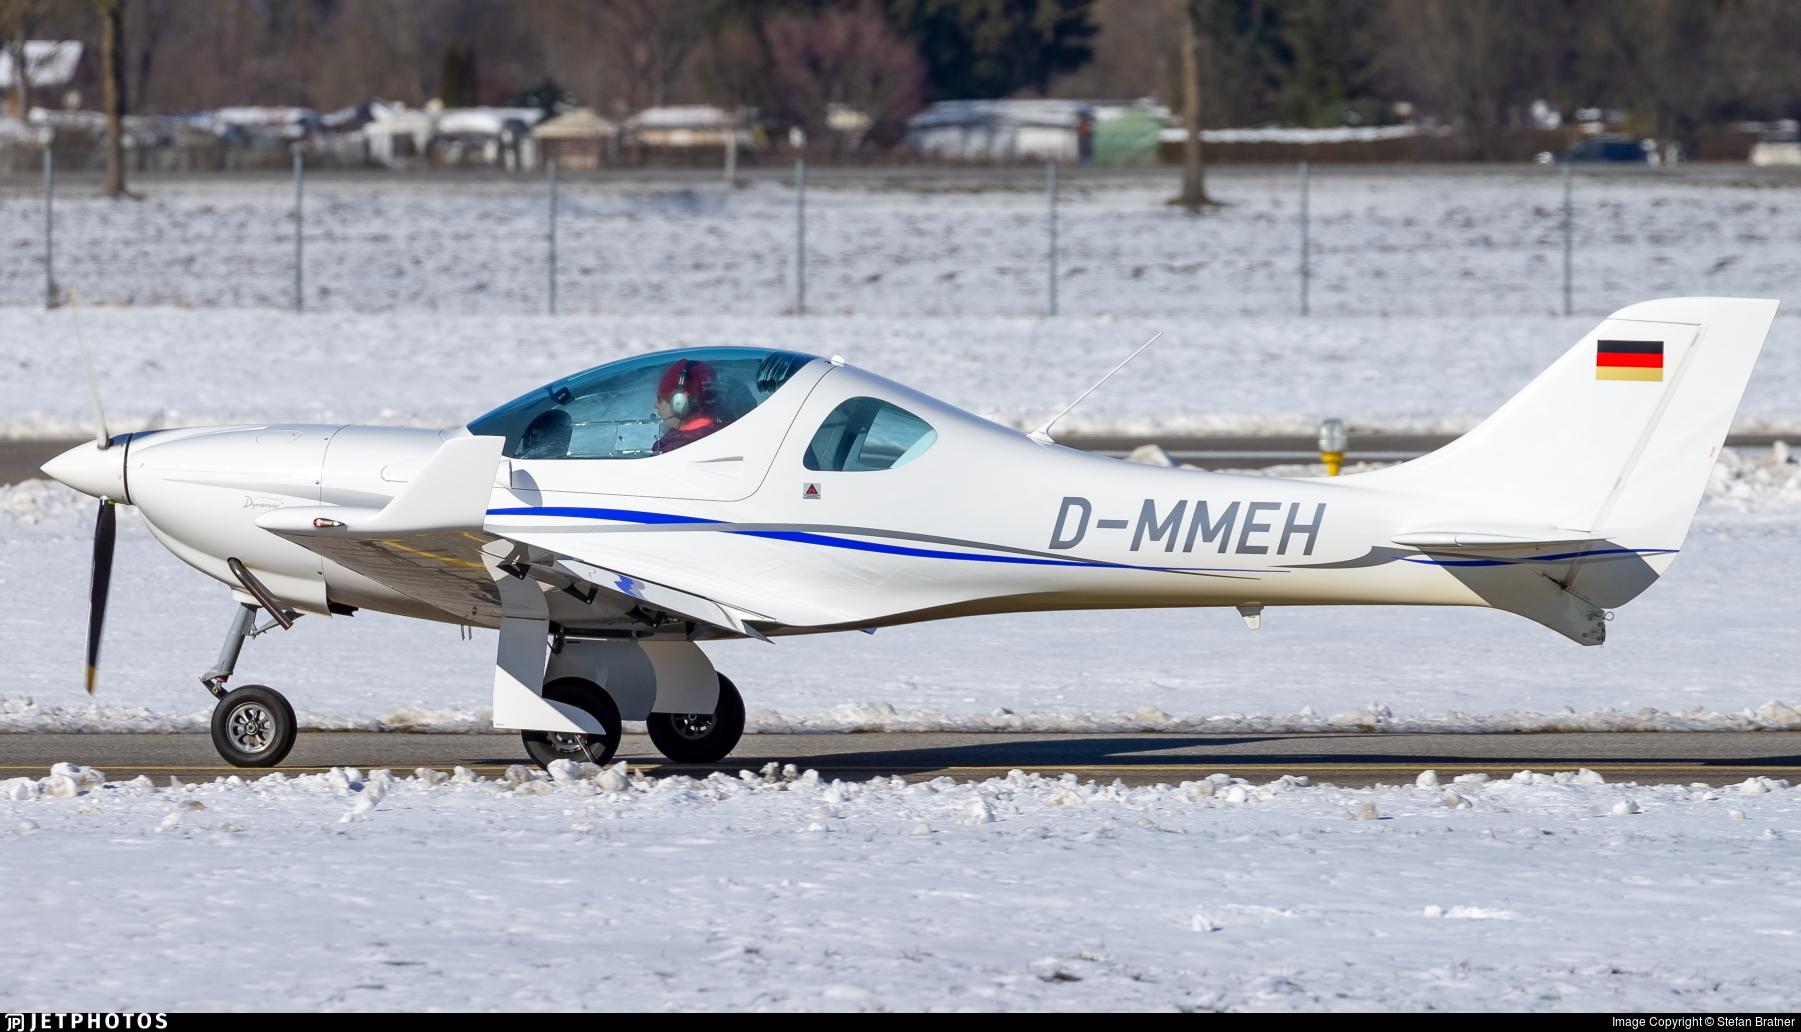 D-MMEH - AeroSpool Dynamic WT9 - Private